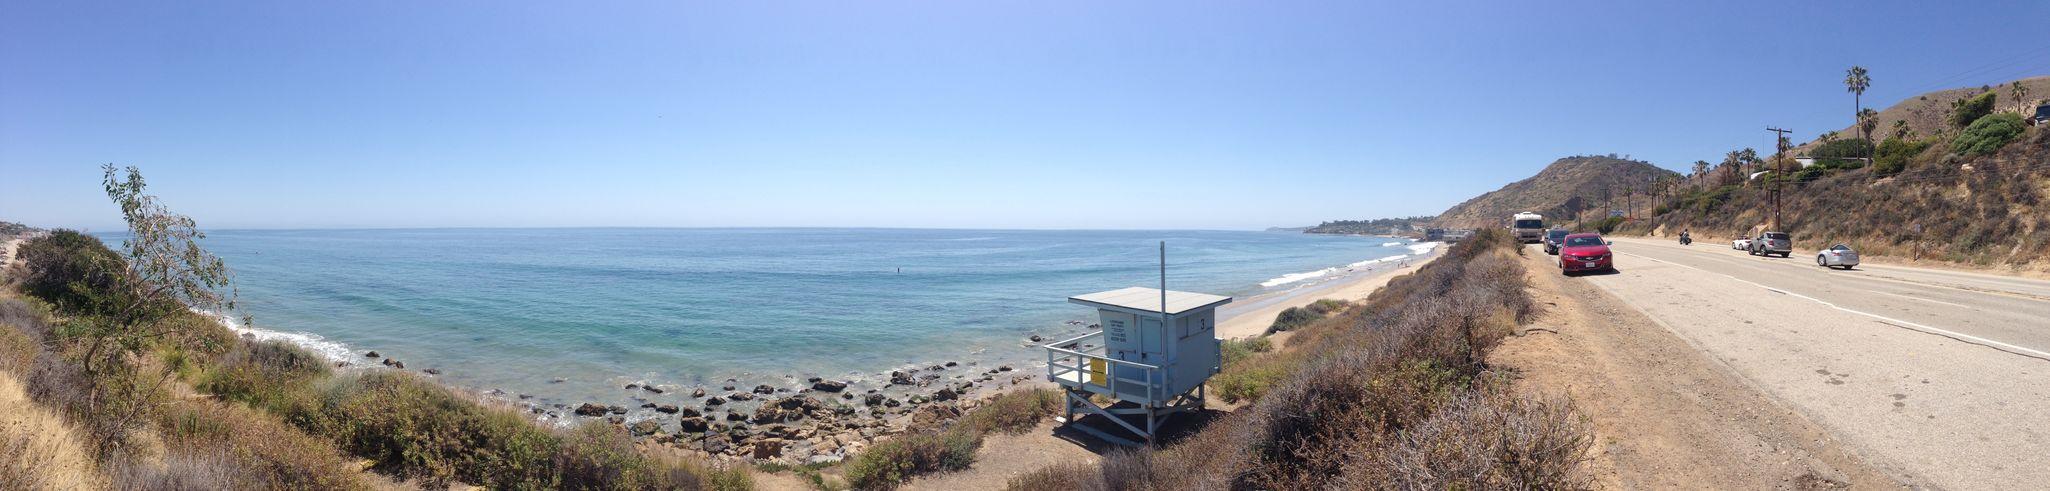 Malibu ! Malibu The Traveler - 2015 EyeEm Awards Malibu Beach California CaliLife